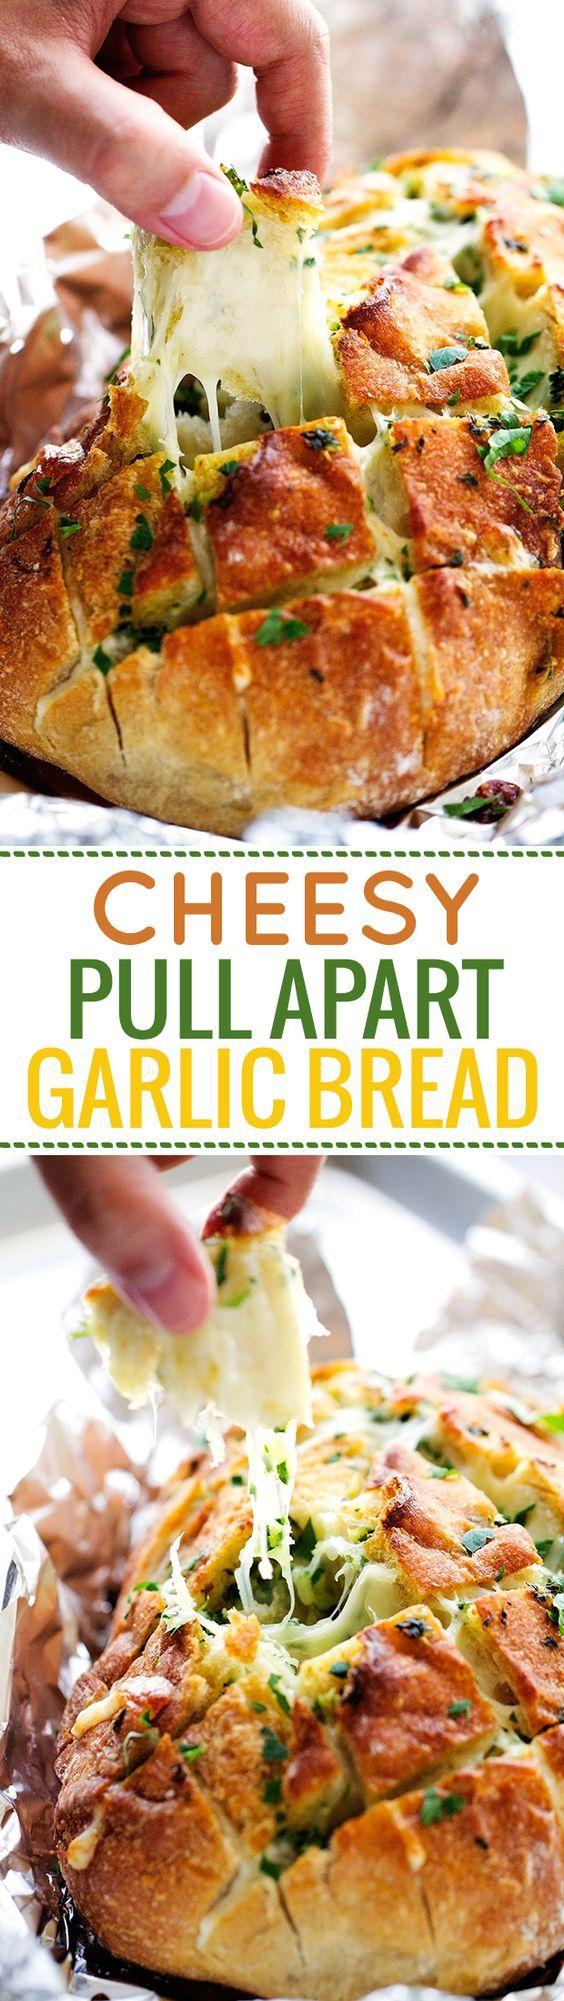 Cheesy Garlic Pull Apart Bread - Load bread stuffed with fresh mozzarella cheese and melted garlic butter. You'll NEVER eat regular garlic bread EVER again! #garlicbread #pullapartbread #crackbread   Littlespicejar.com: